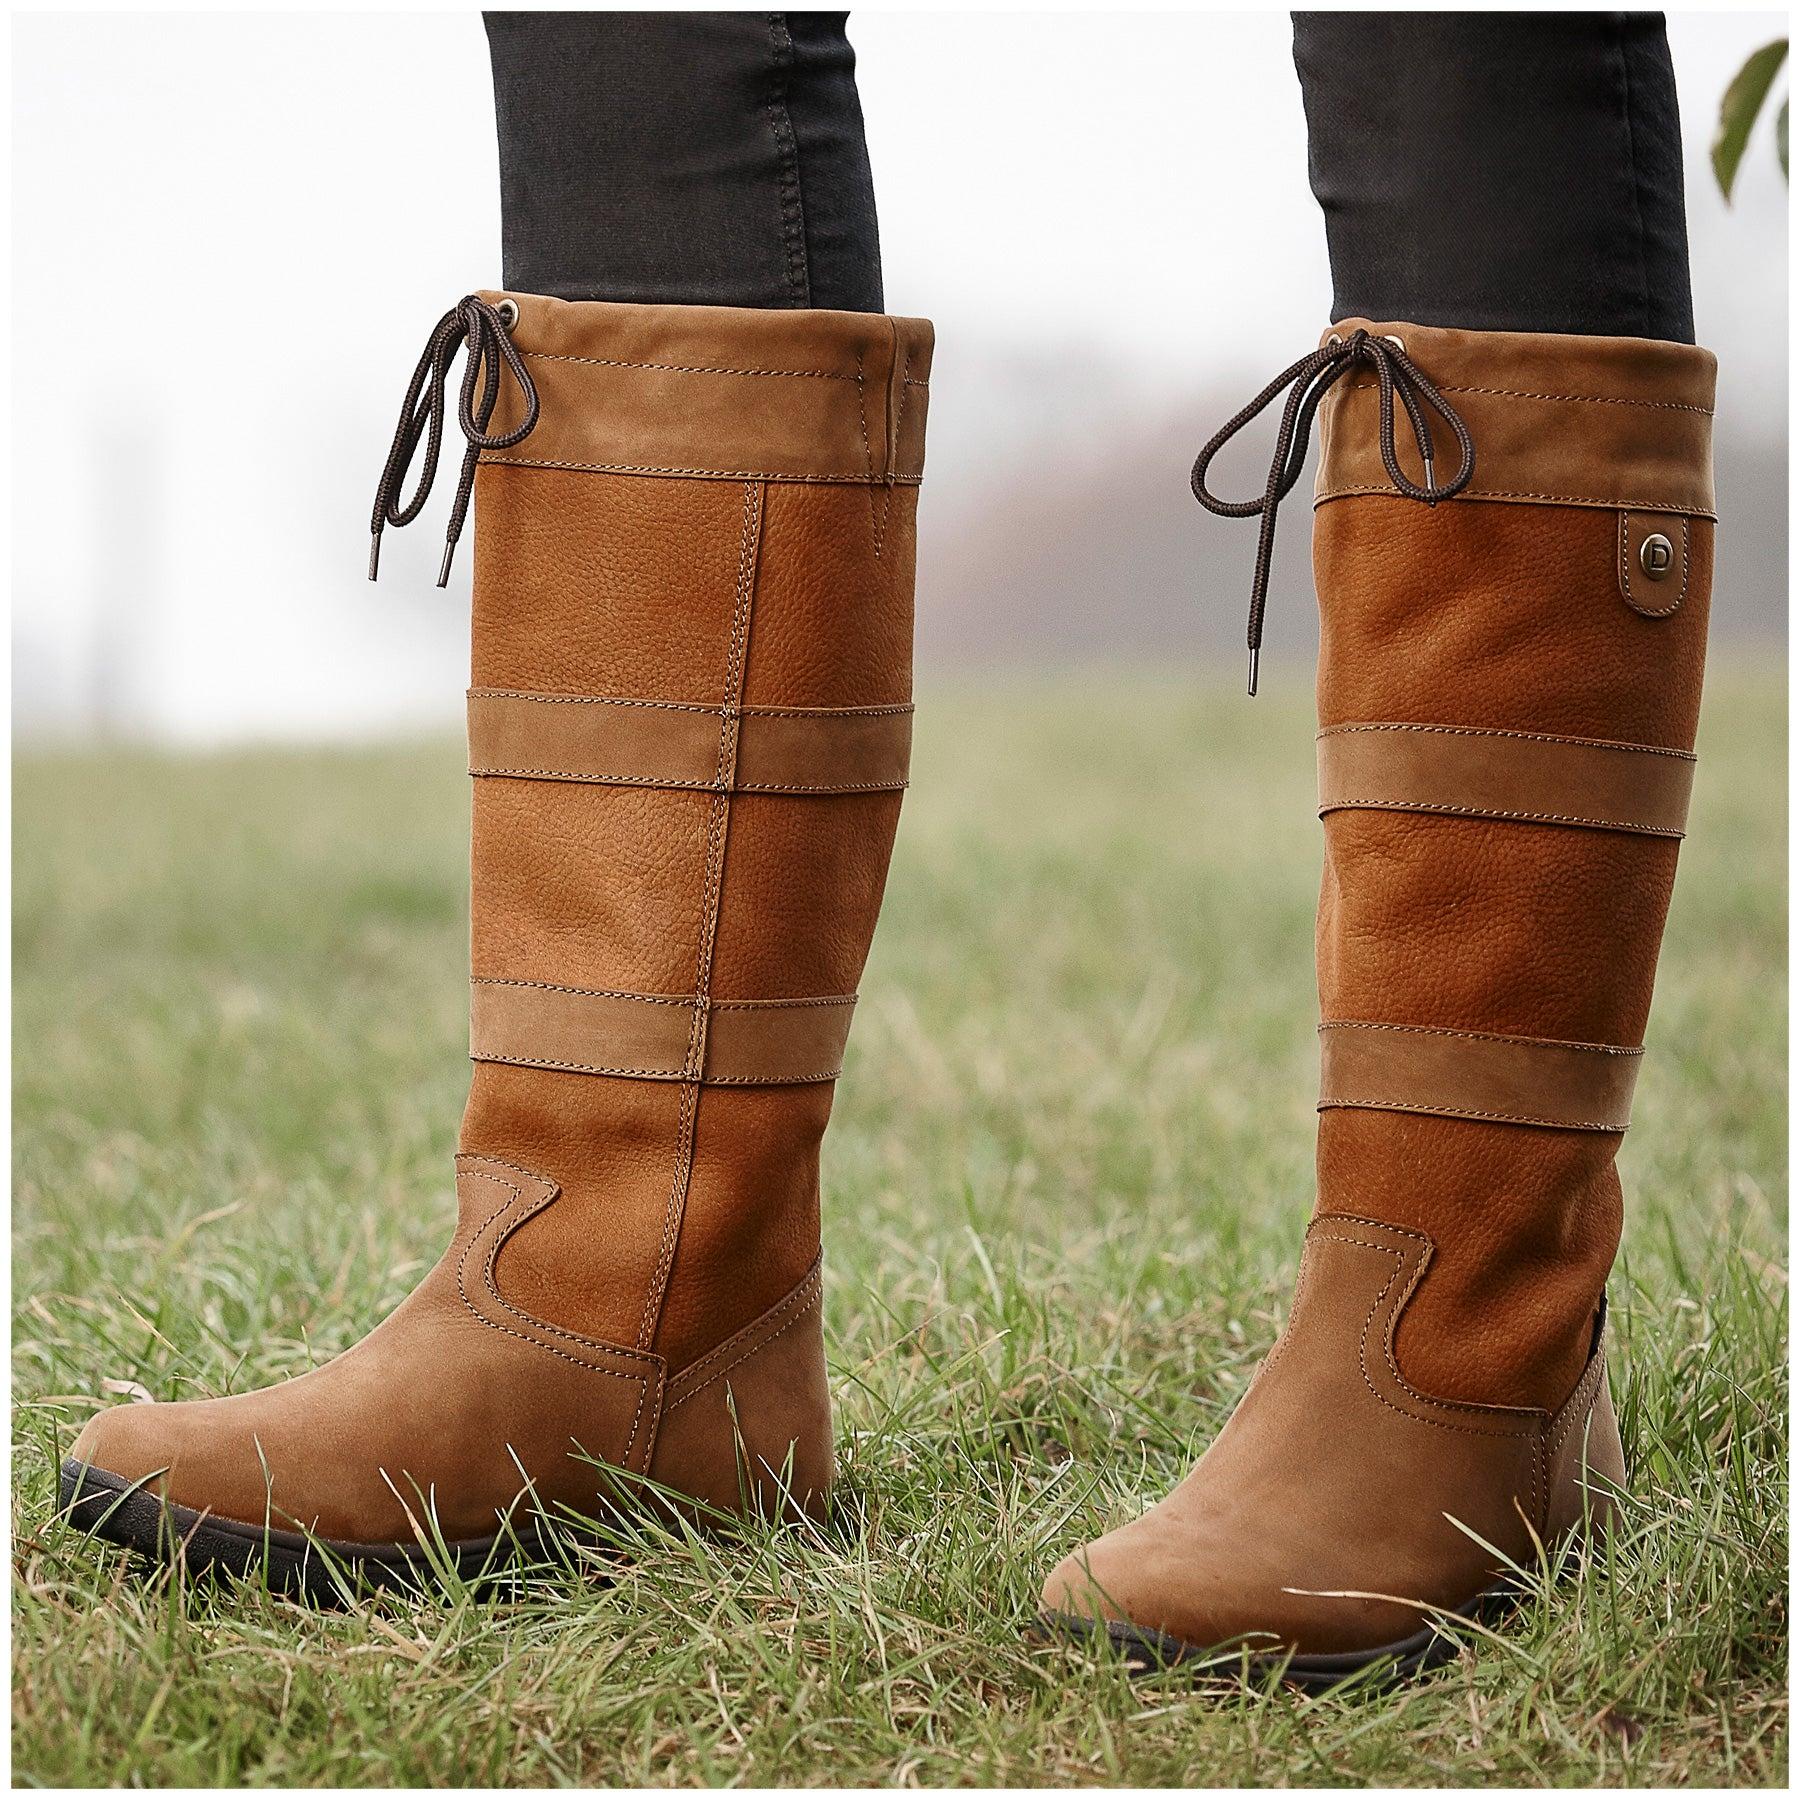 Dublin River Iii Women S Tall Boots Tan Riding Warehouse